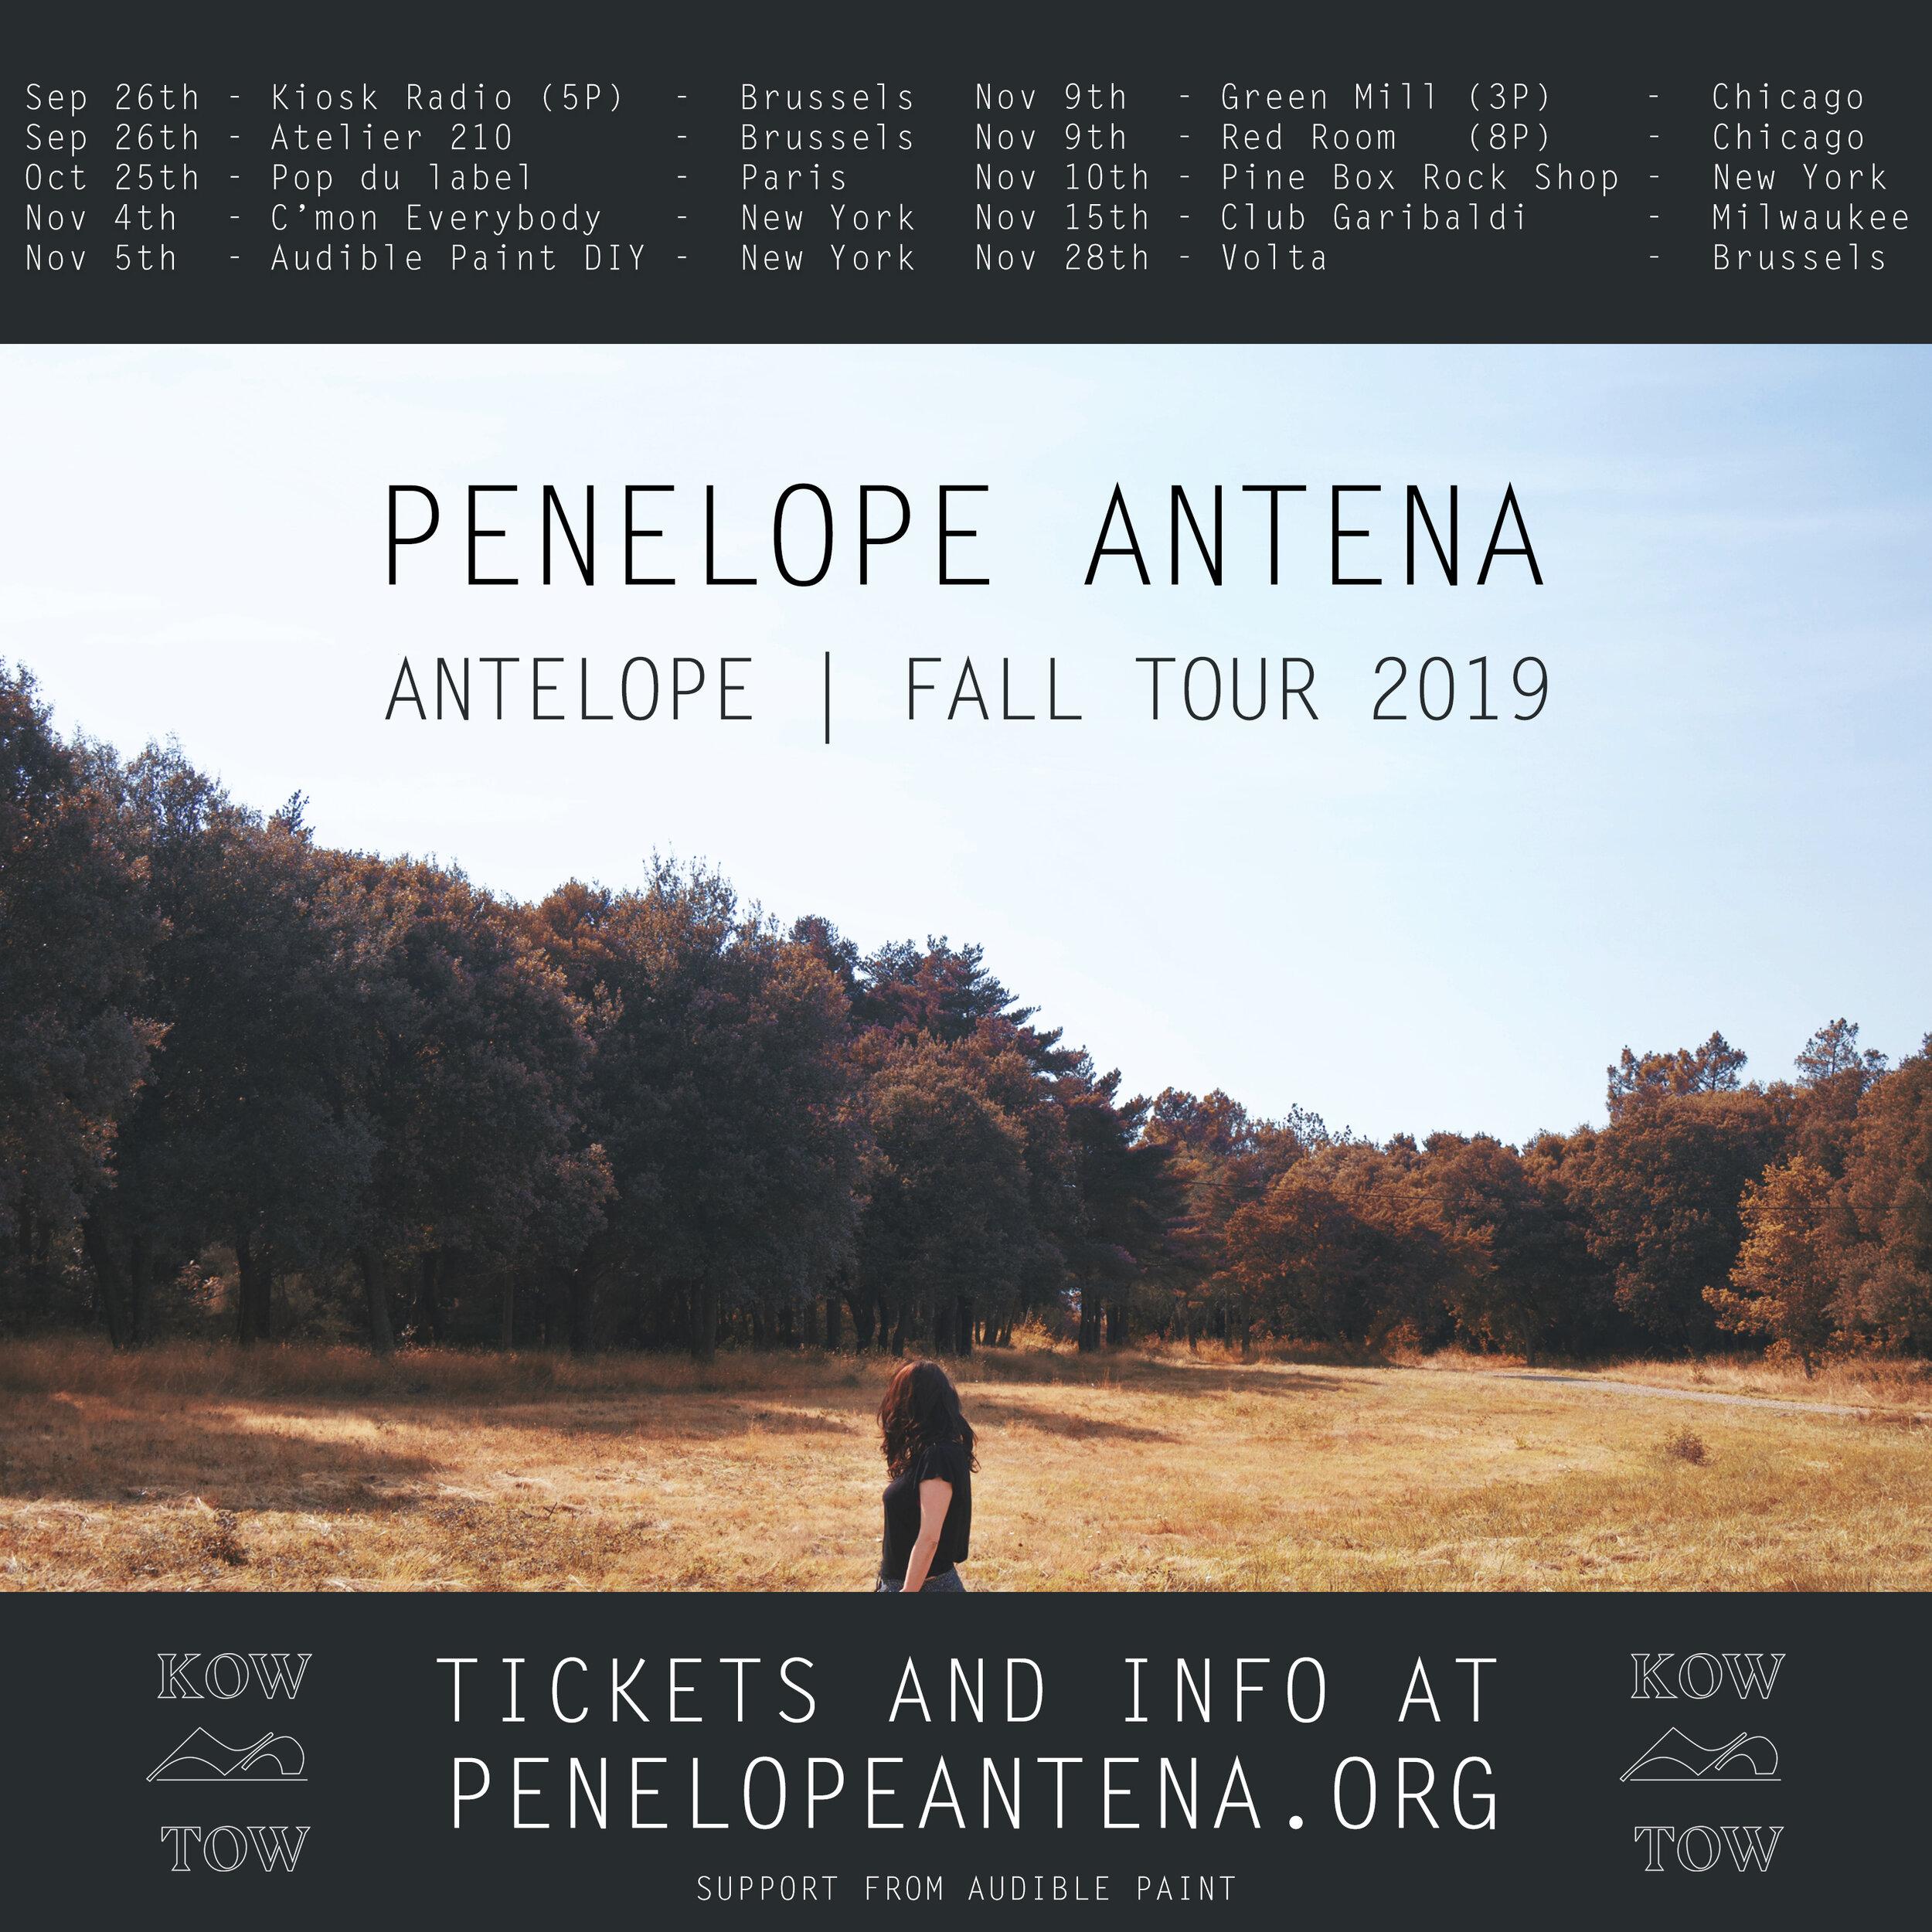 Penny Tour Dates.jpg